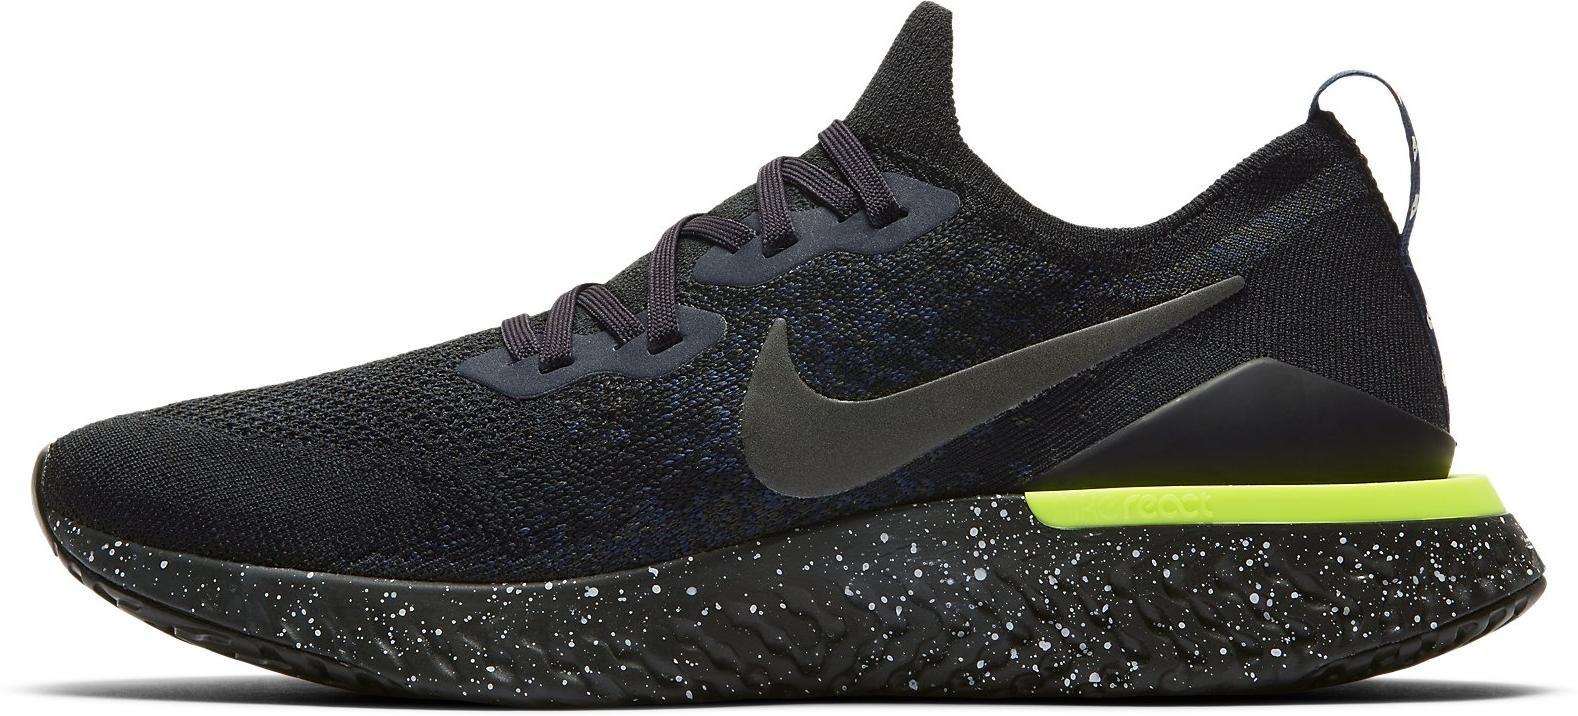 Chaussures de running Nike EPIC REACT FLYKNIT 2 SE